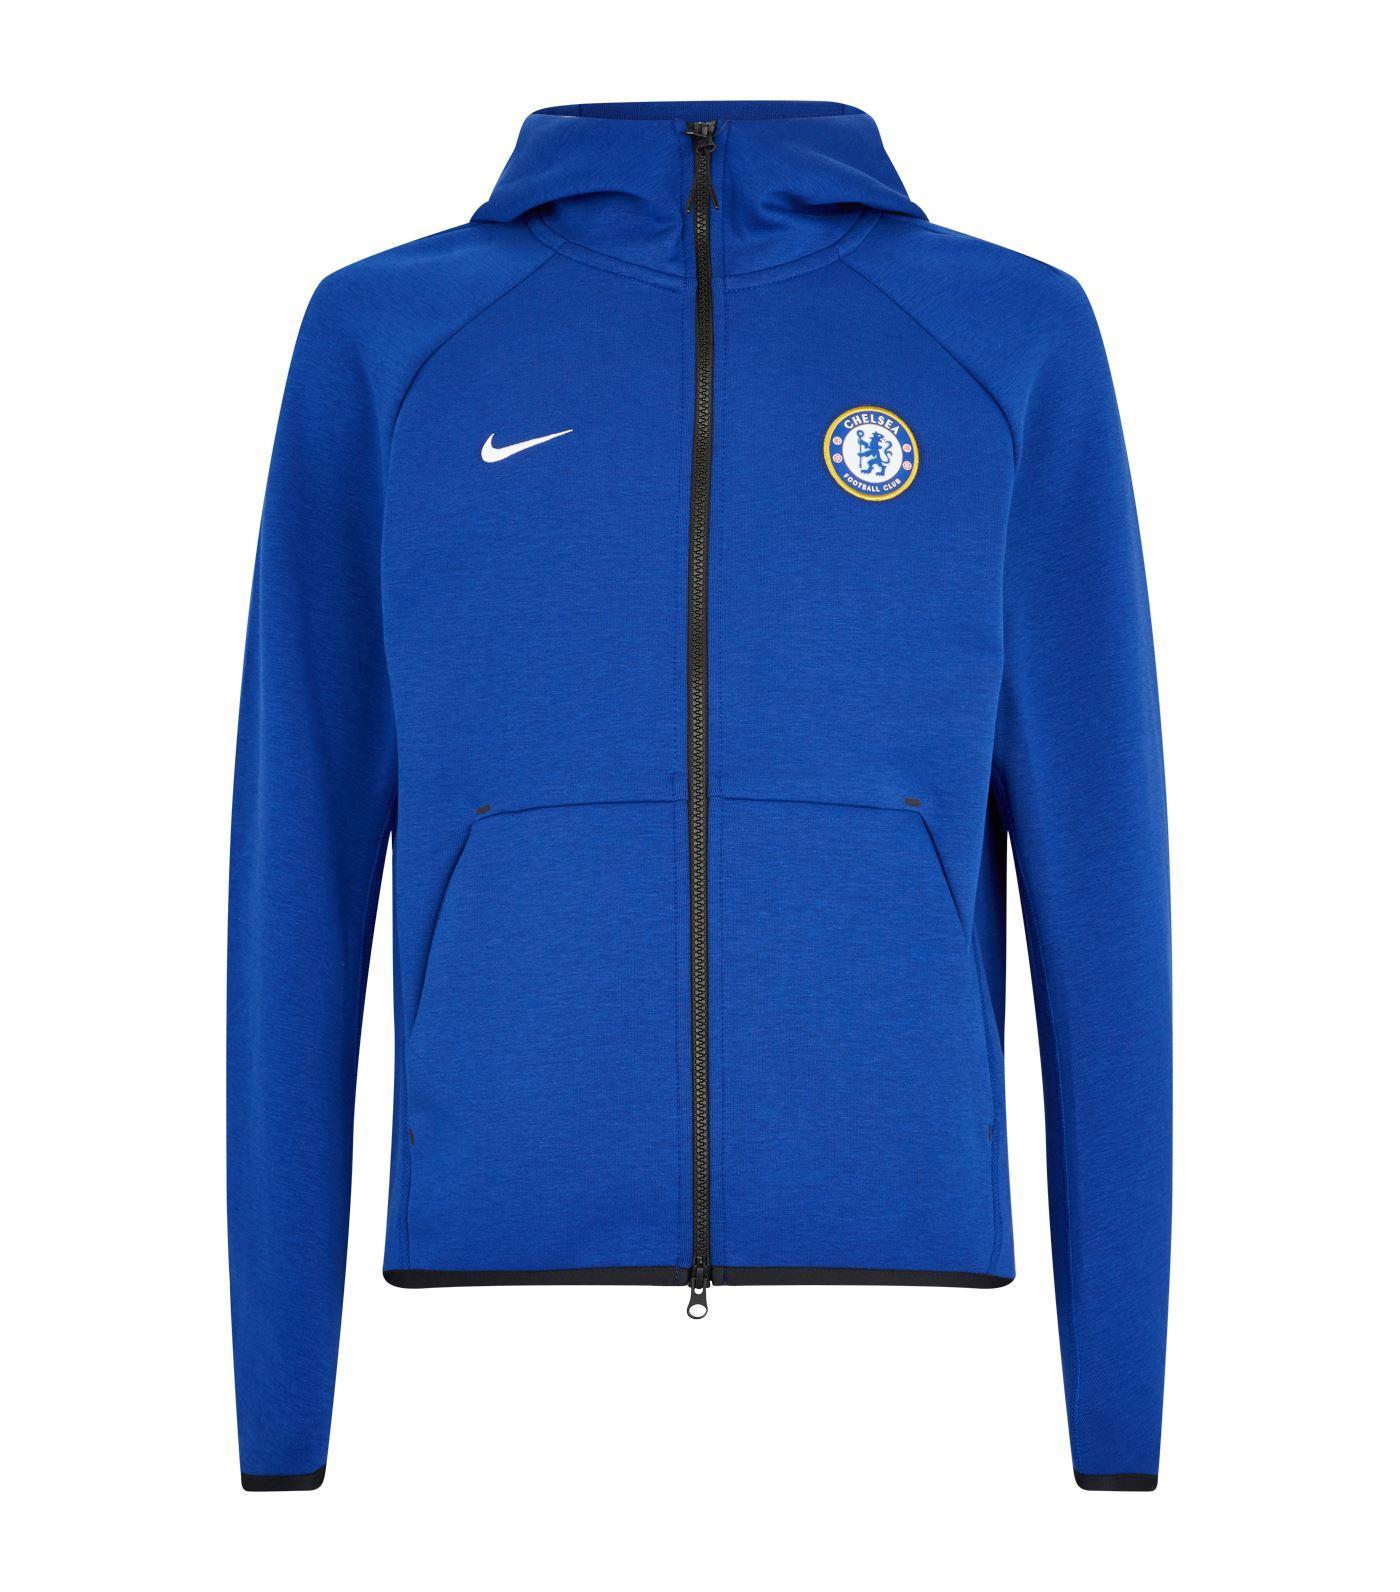 e0d6eee1a Nike Chelsea Fc Zip-through Hoodie in Blue for Men - Lyst